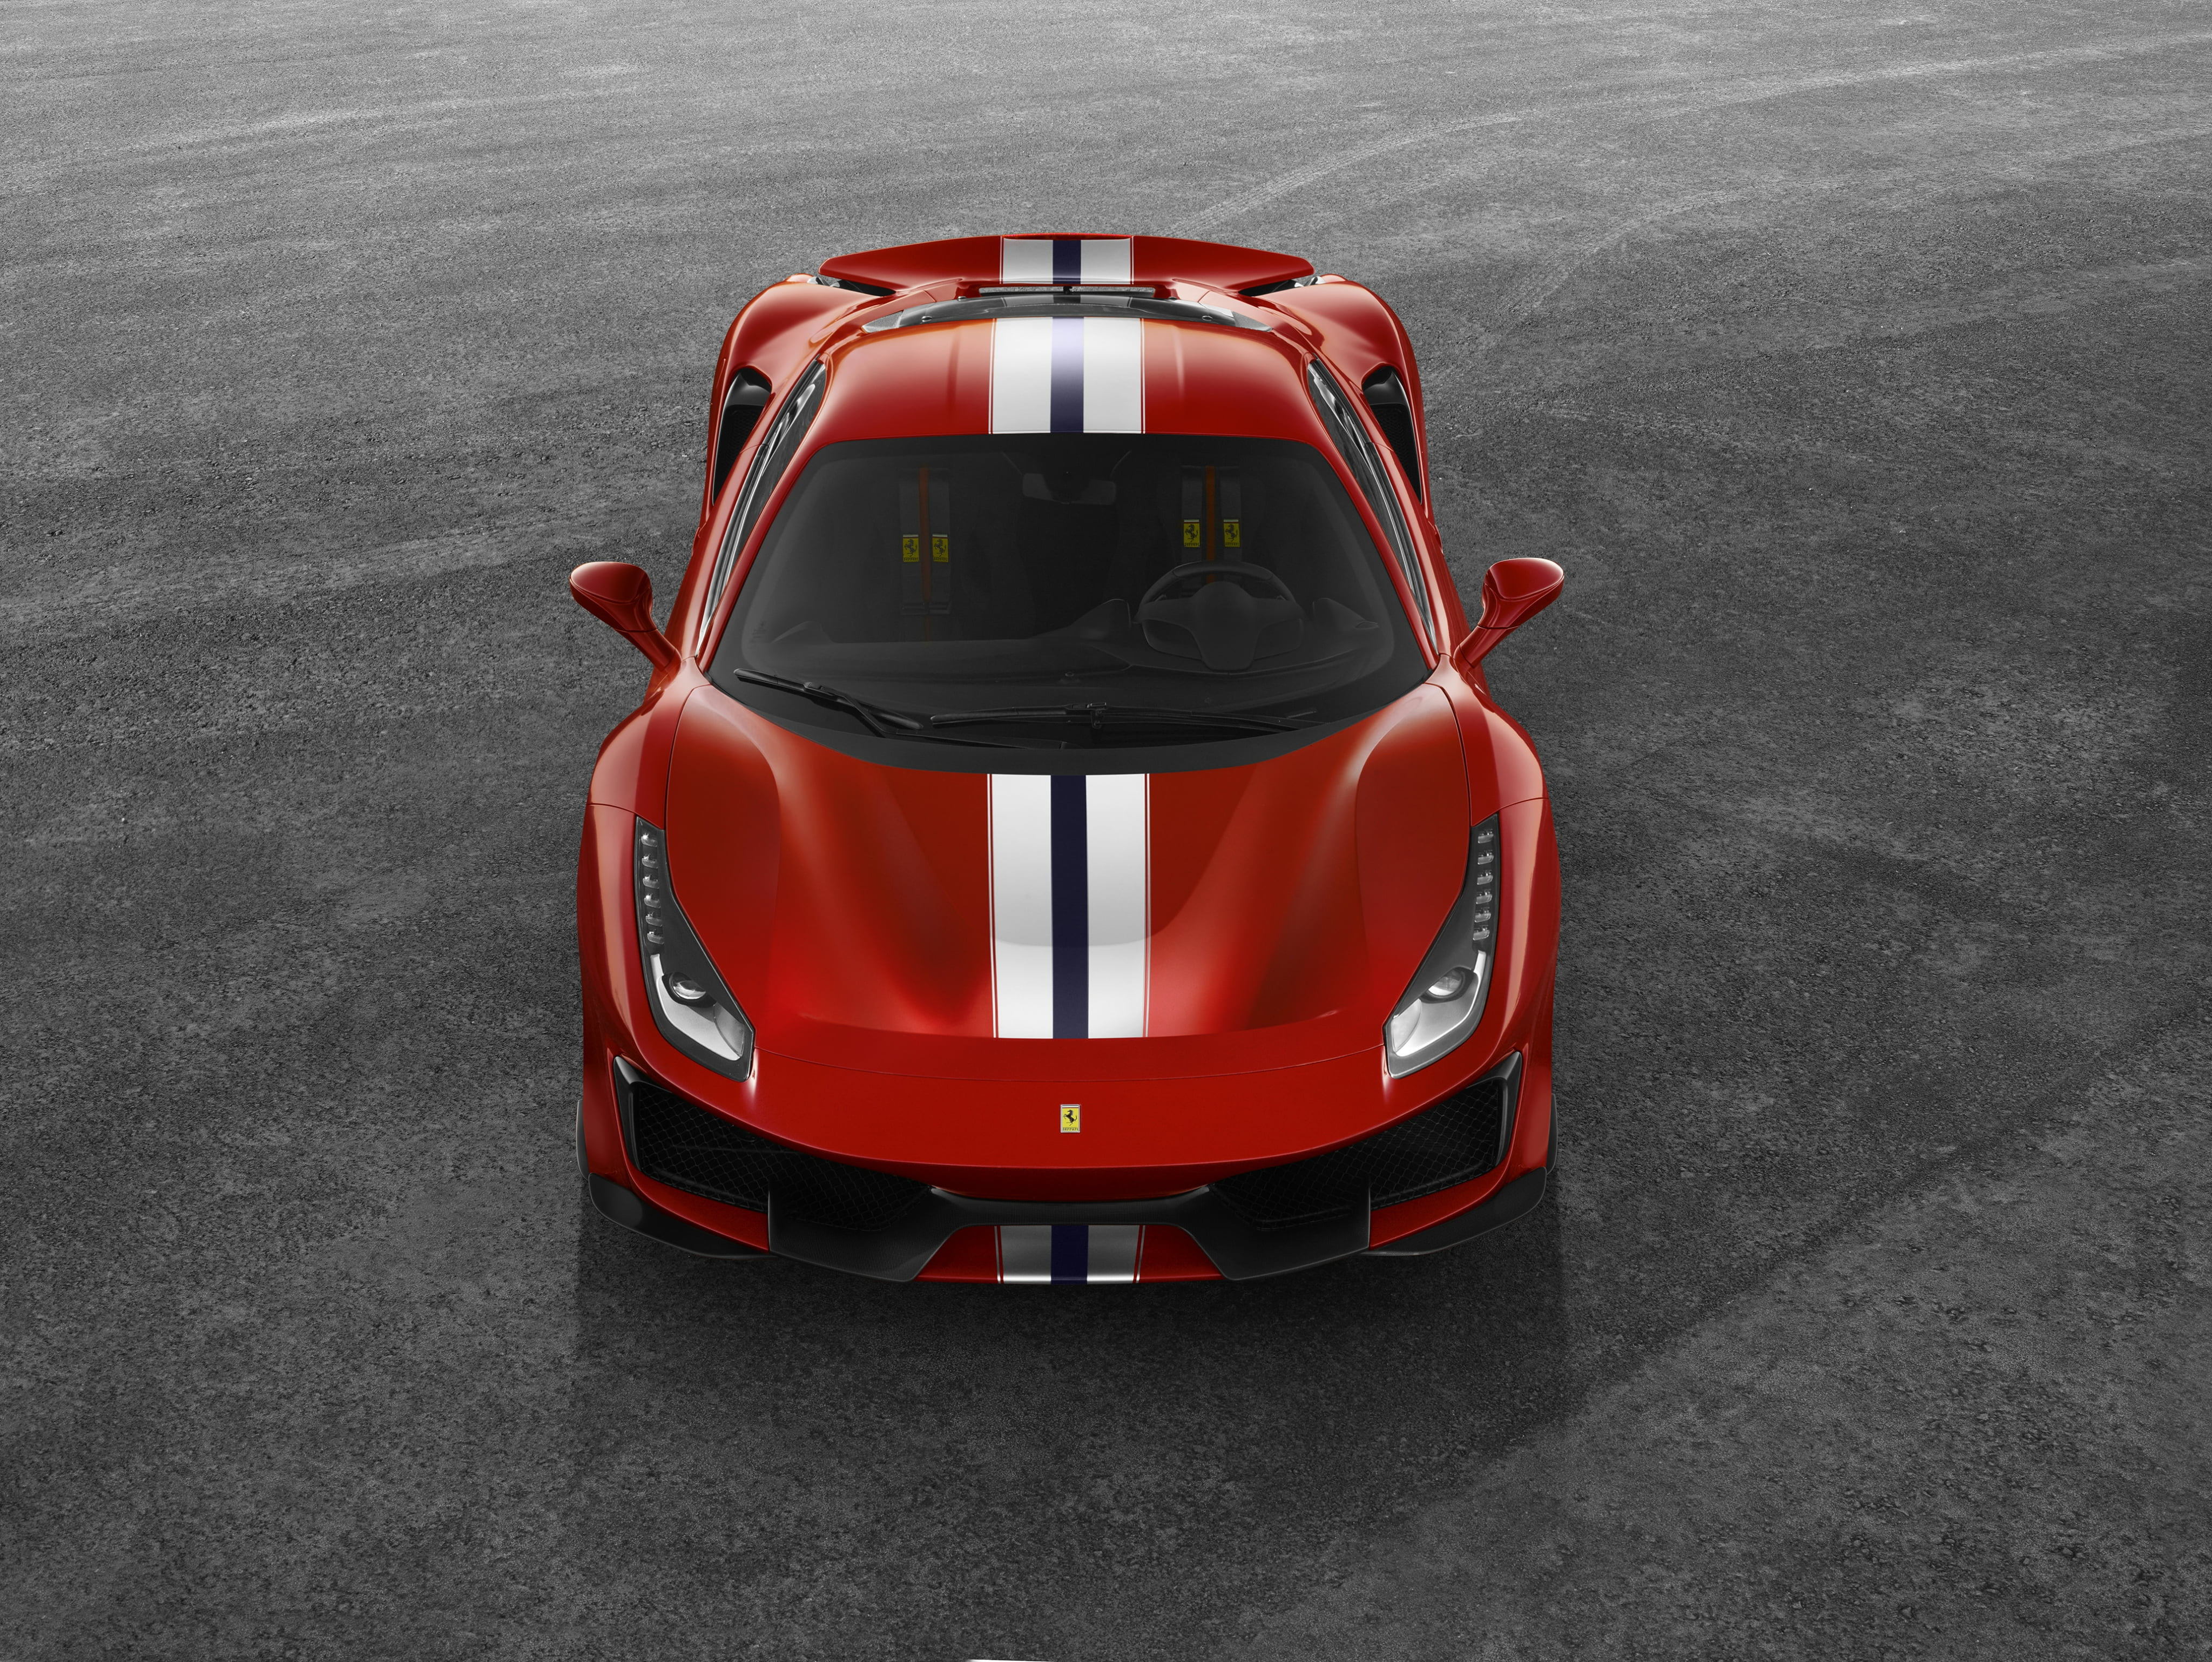 Ferrari 488 Pista Spider 4096x3077 Wallpaper Teahub Io